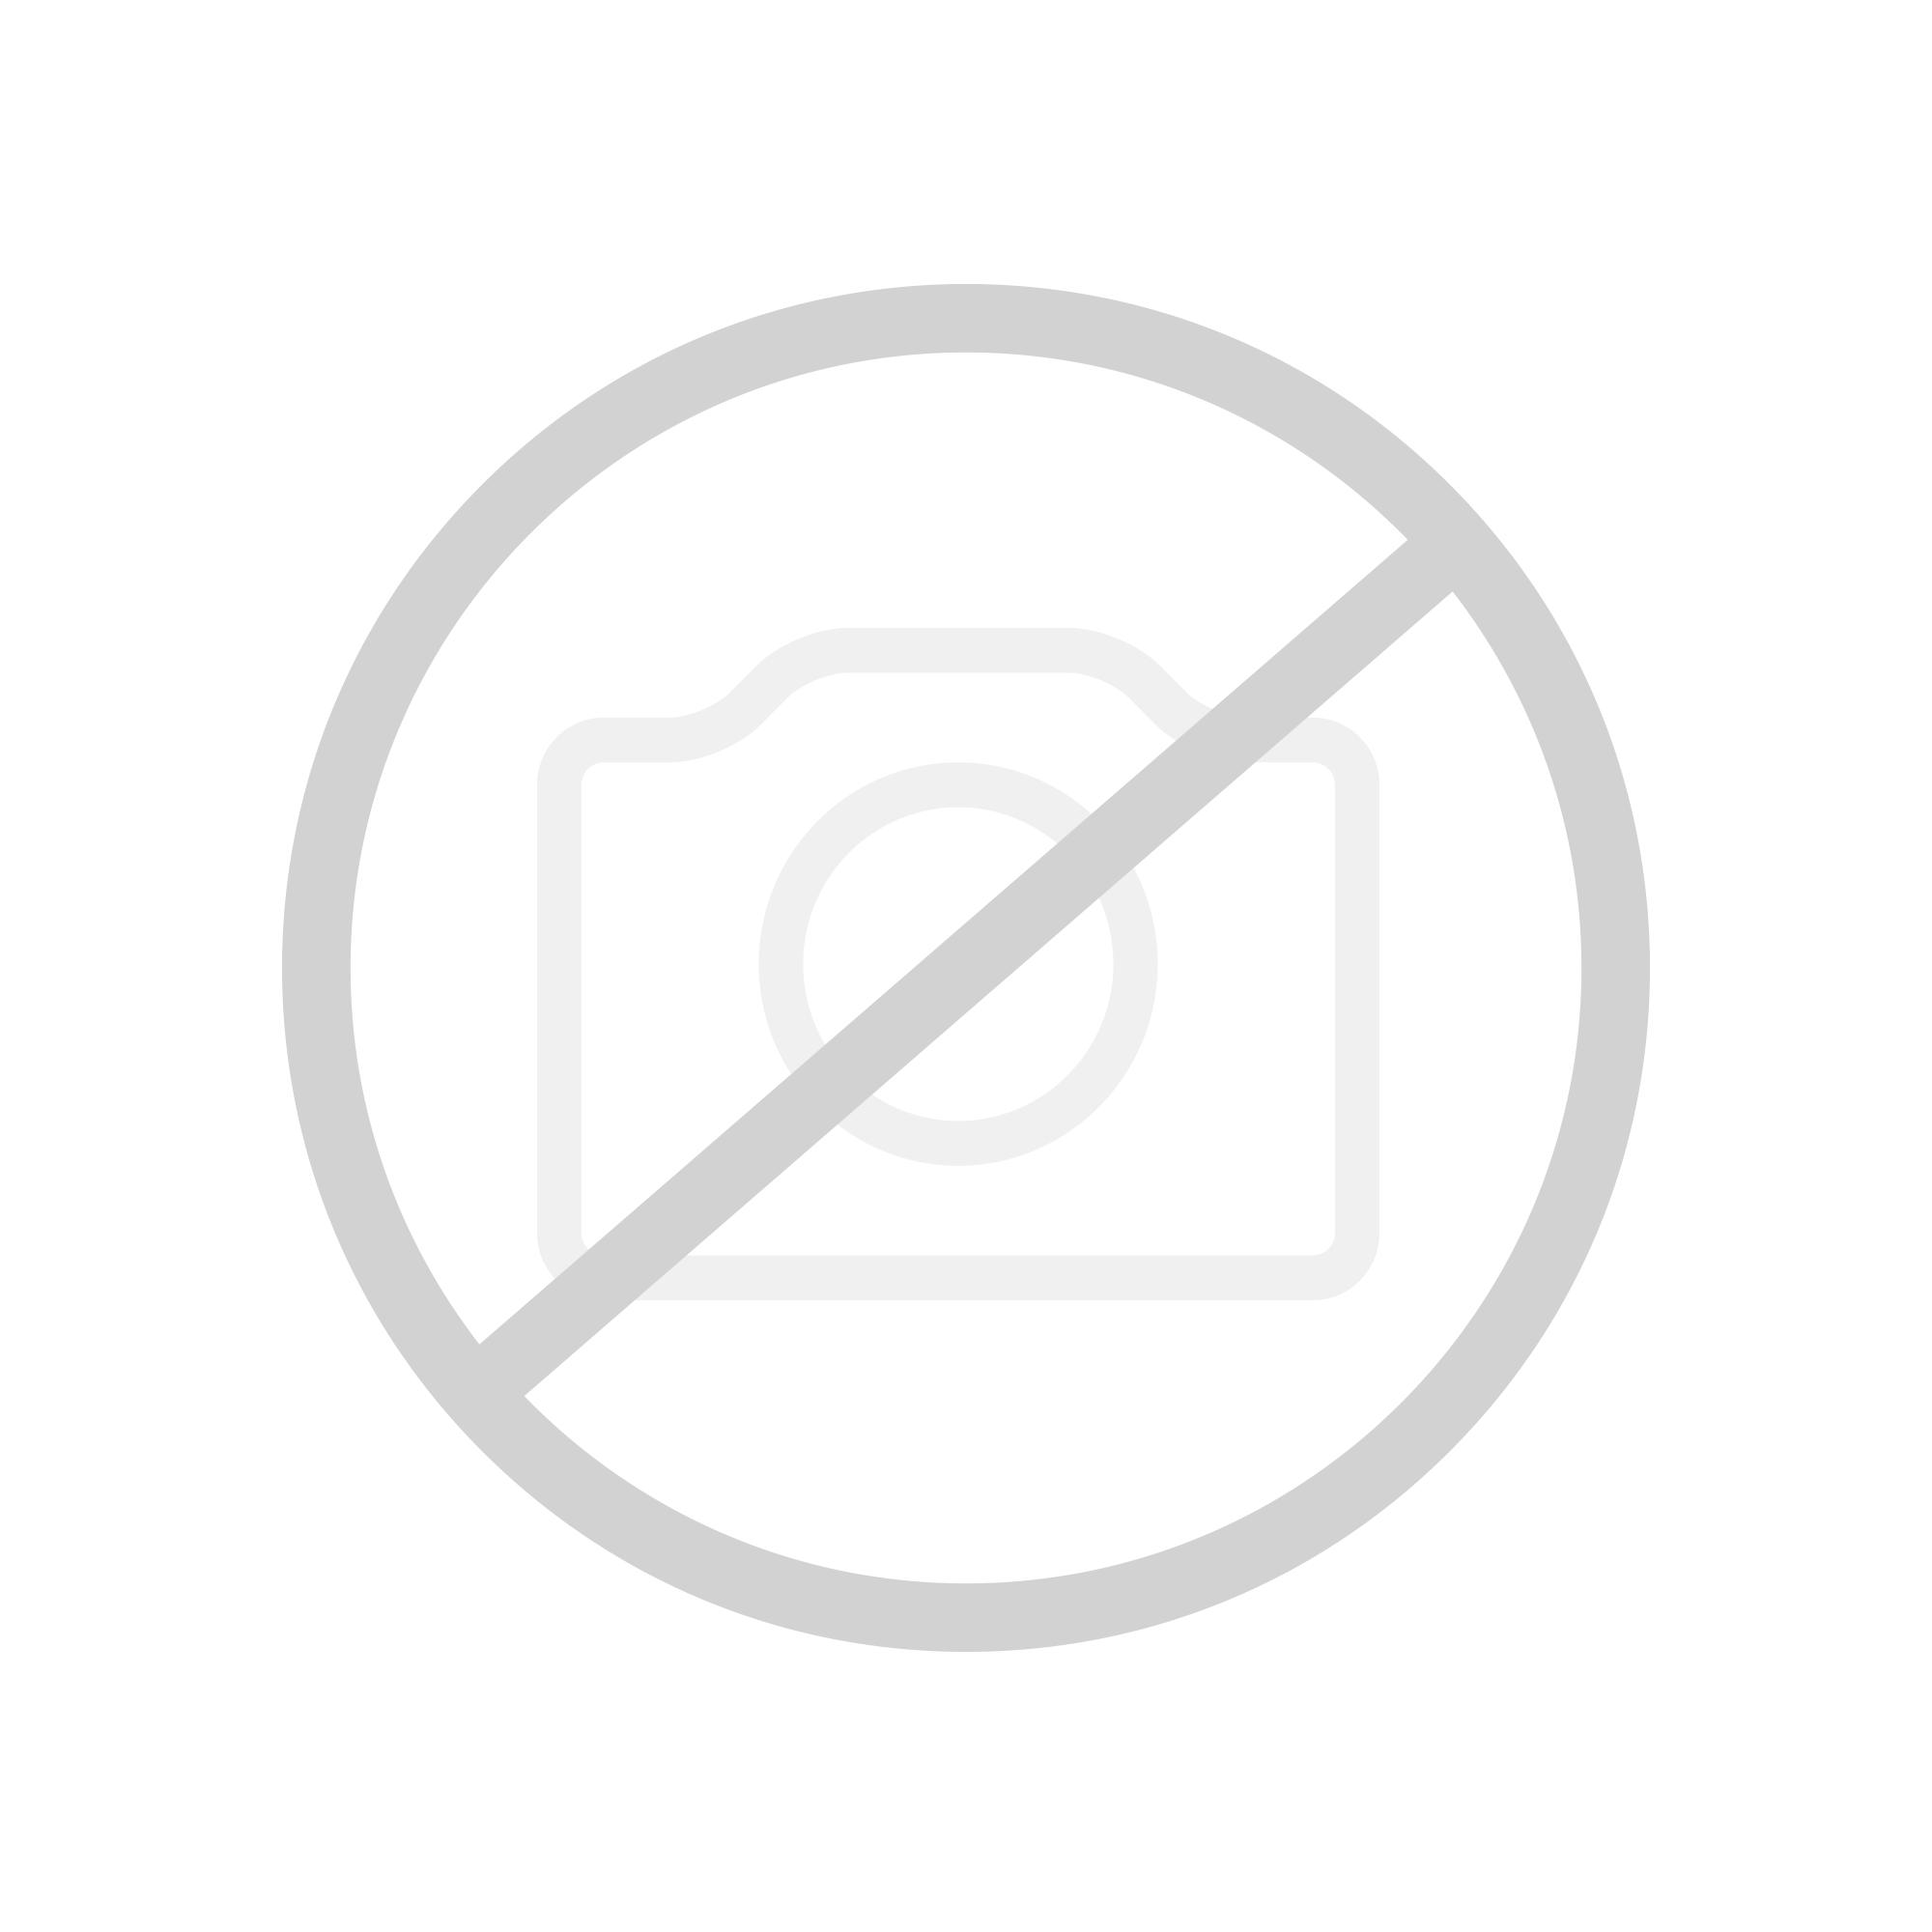 Geberit AP-Spülkasten AP140 mit 2-Mengen-Spülung, Deckel verschraubt